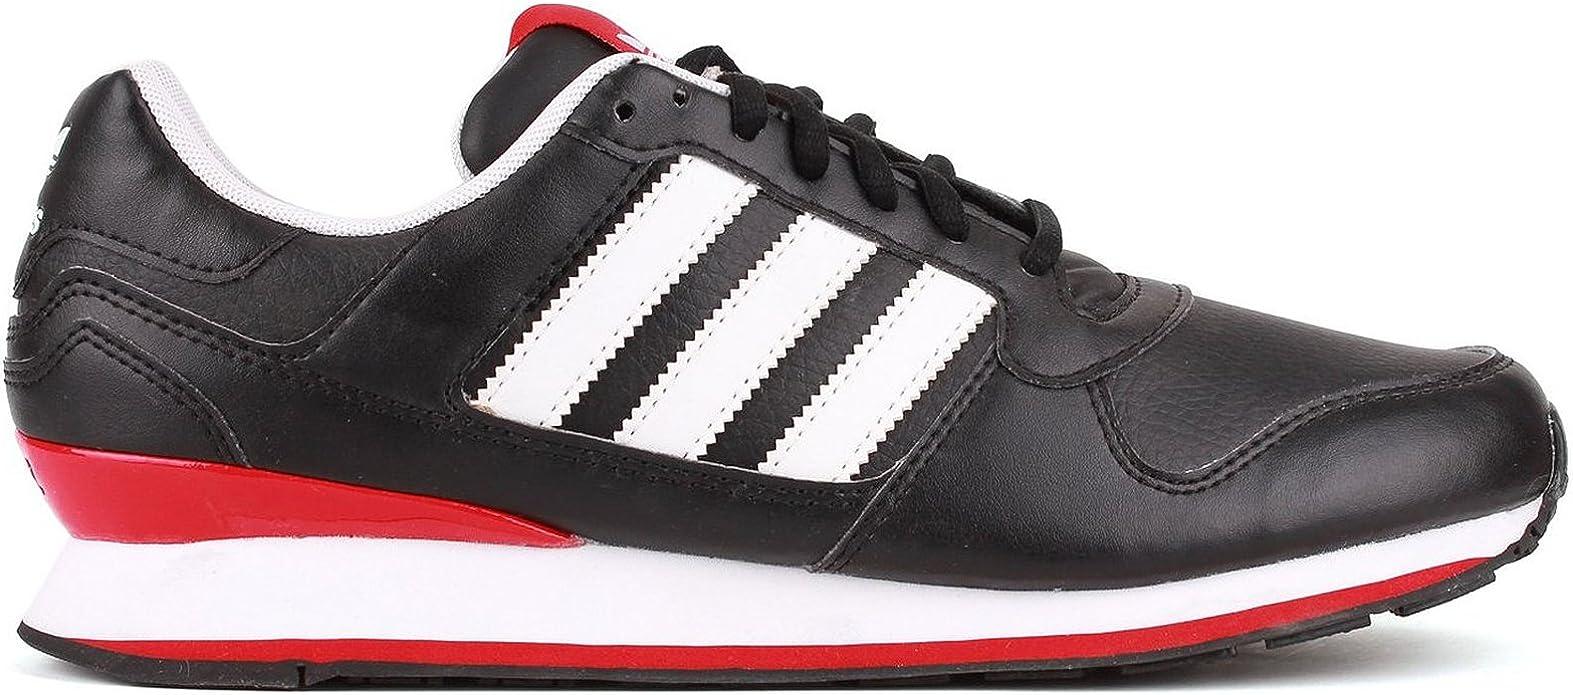 Adidas ZXZ WLB 2 Black White Mens